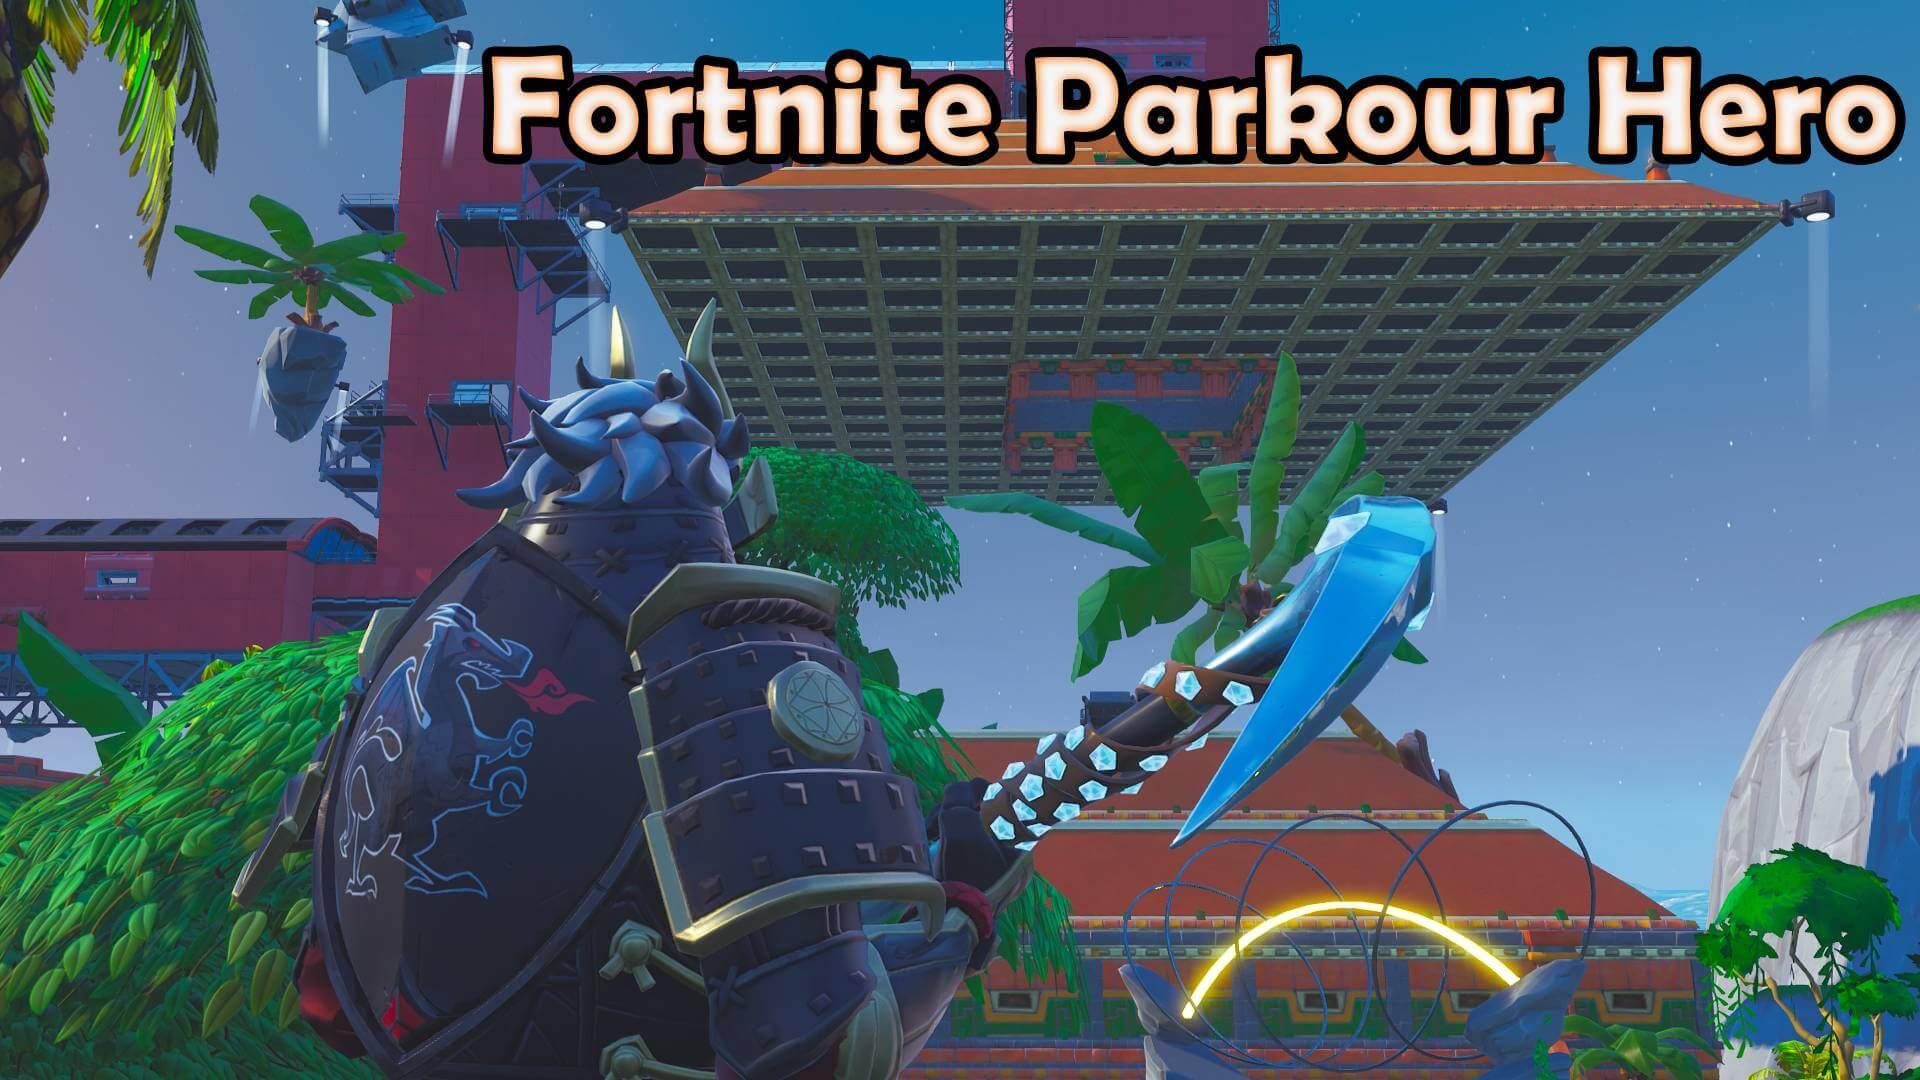 fortnite hero parkour - fortnite parkour maps codes